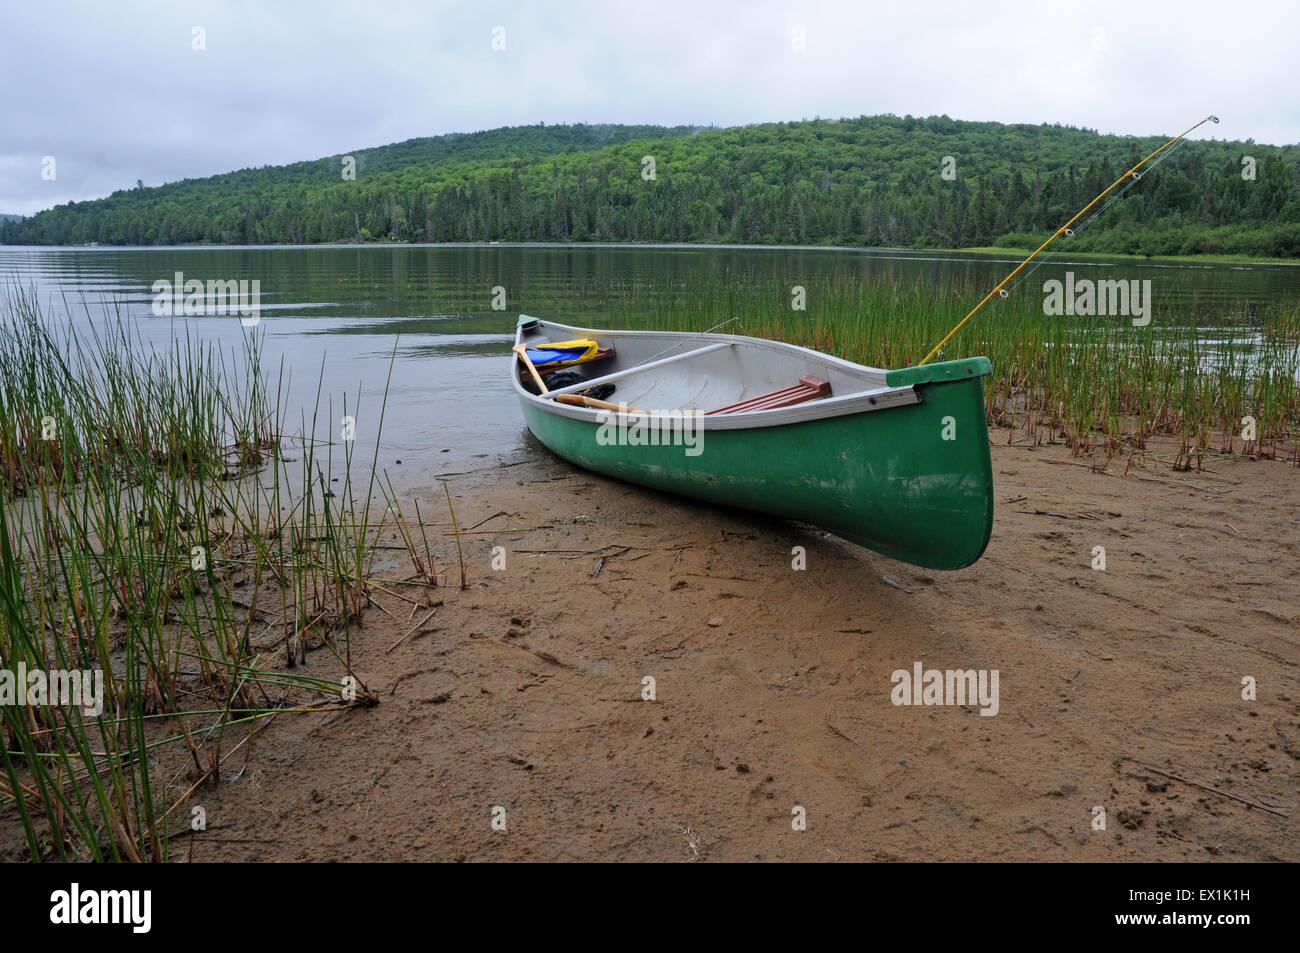 Canoe on edge of a lake - Stock Image